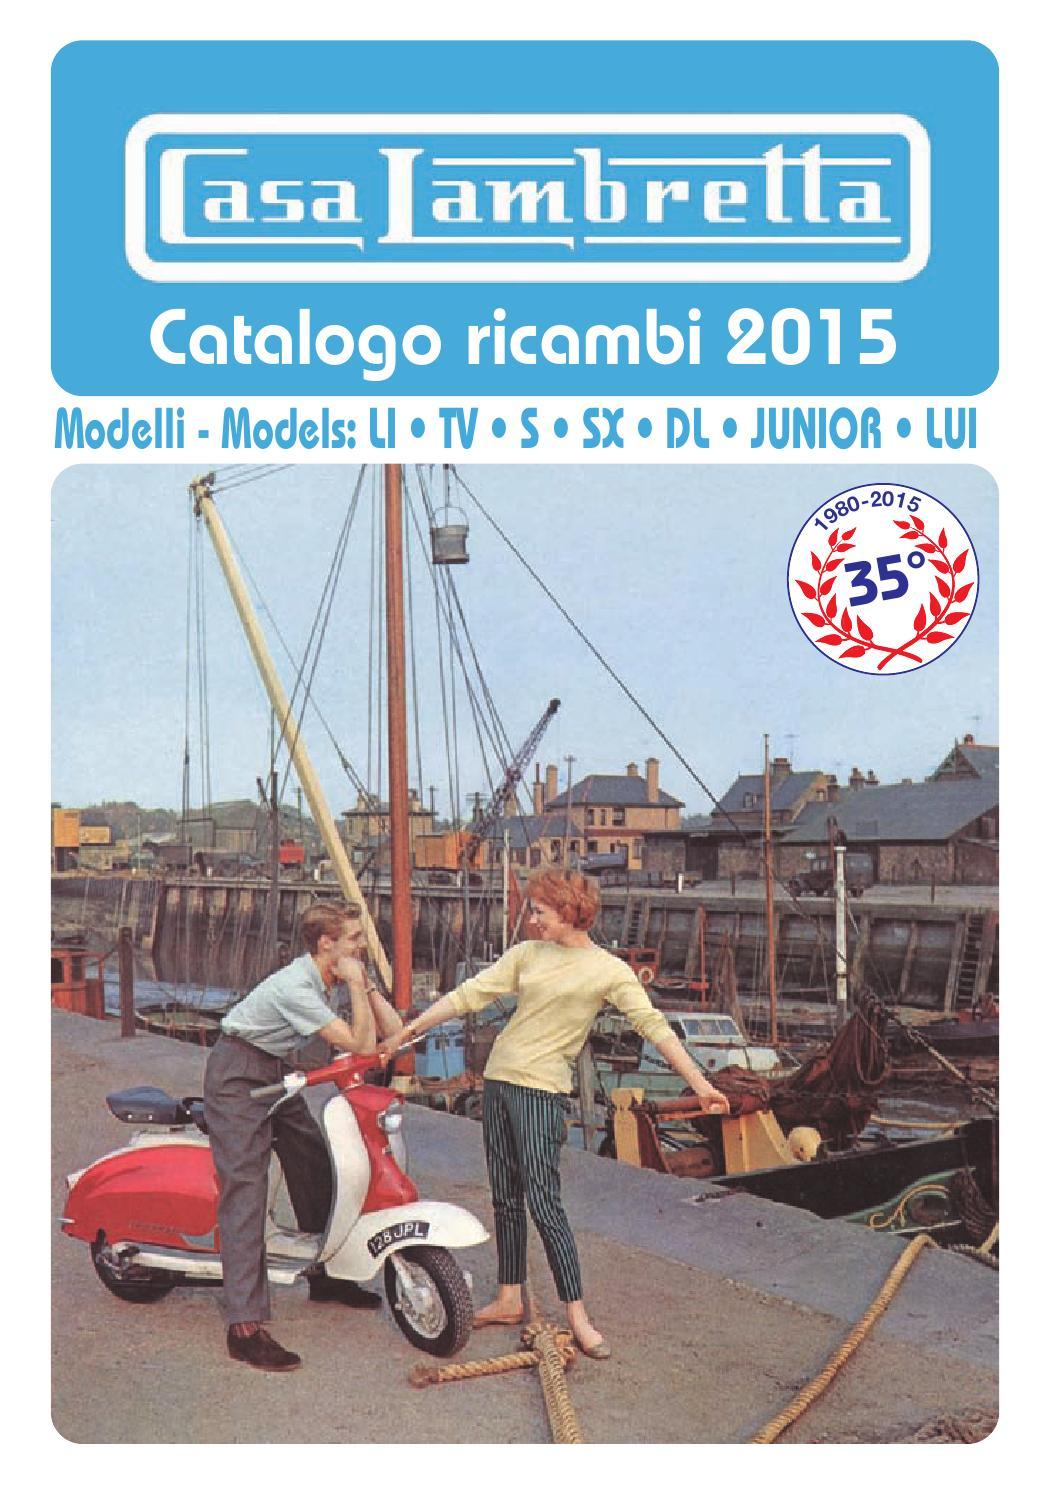 Catalogo ricambi 2015 casa lambretta by fluid for Catalogo casa